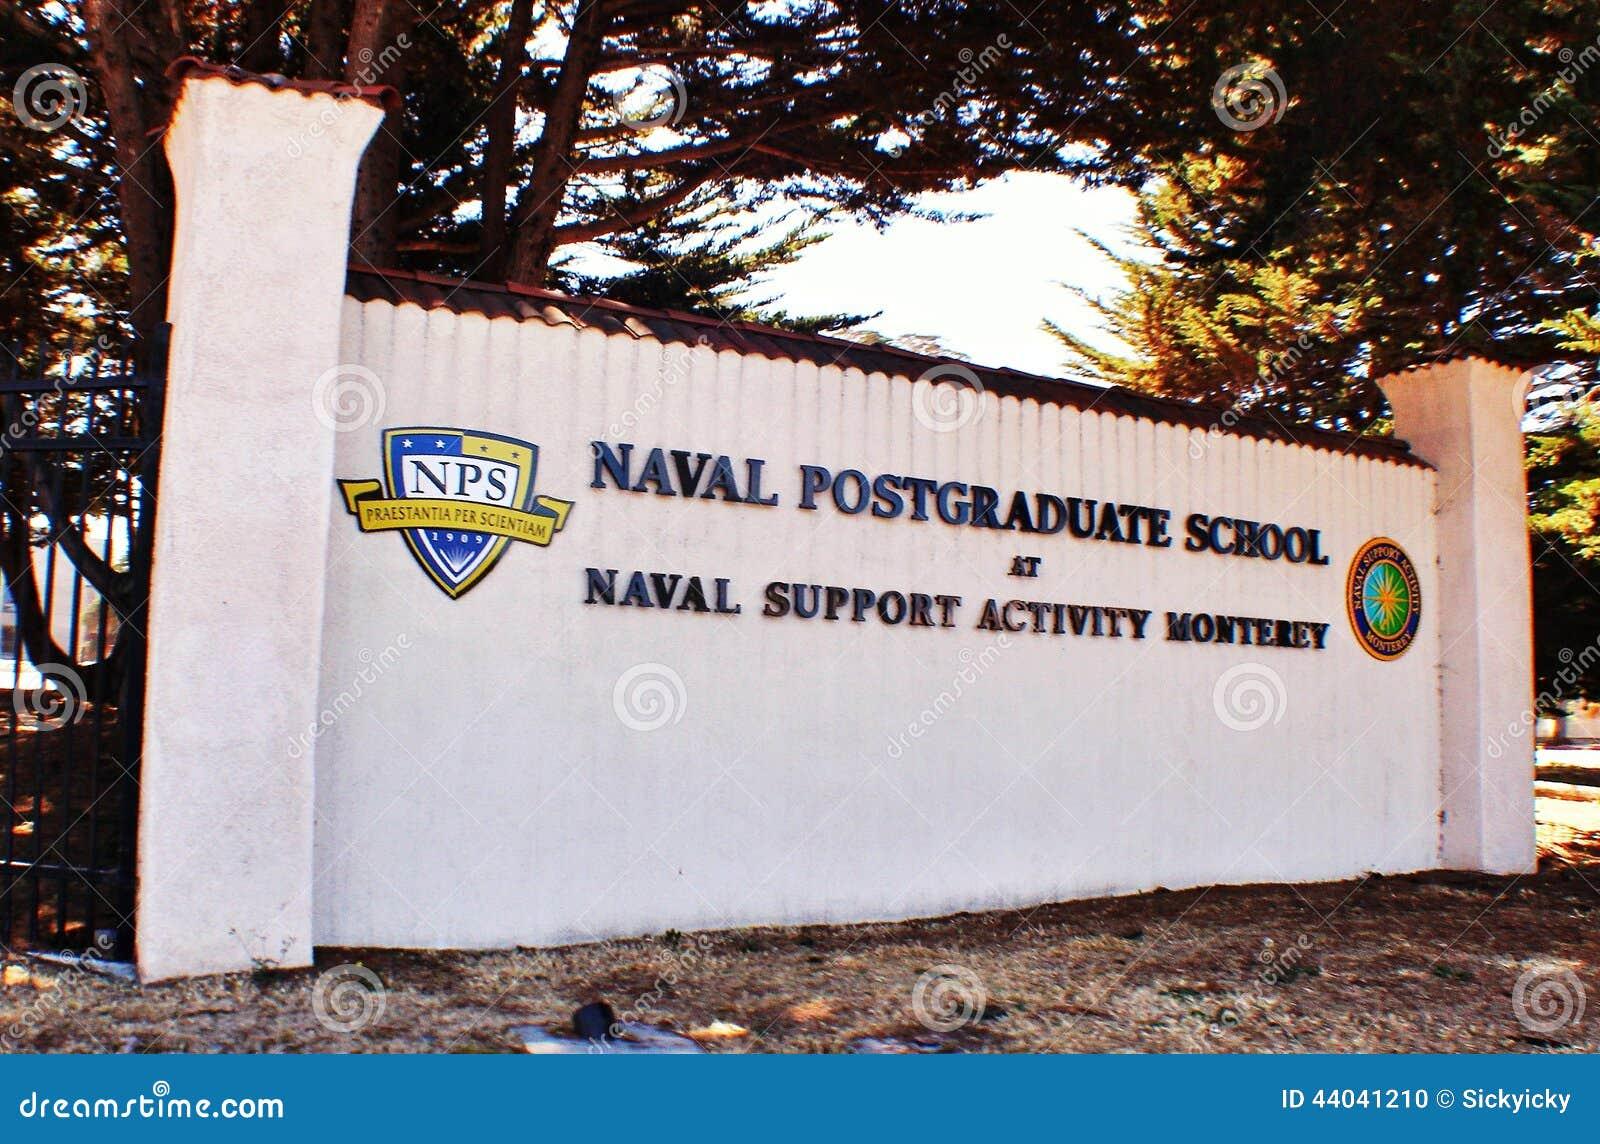 naval postgraduate school Directory